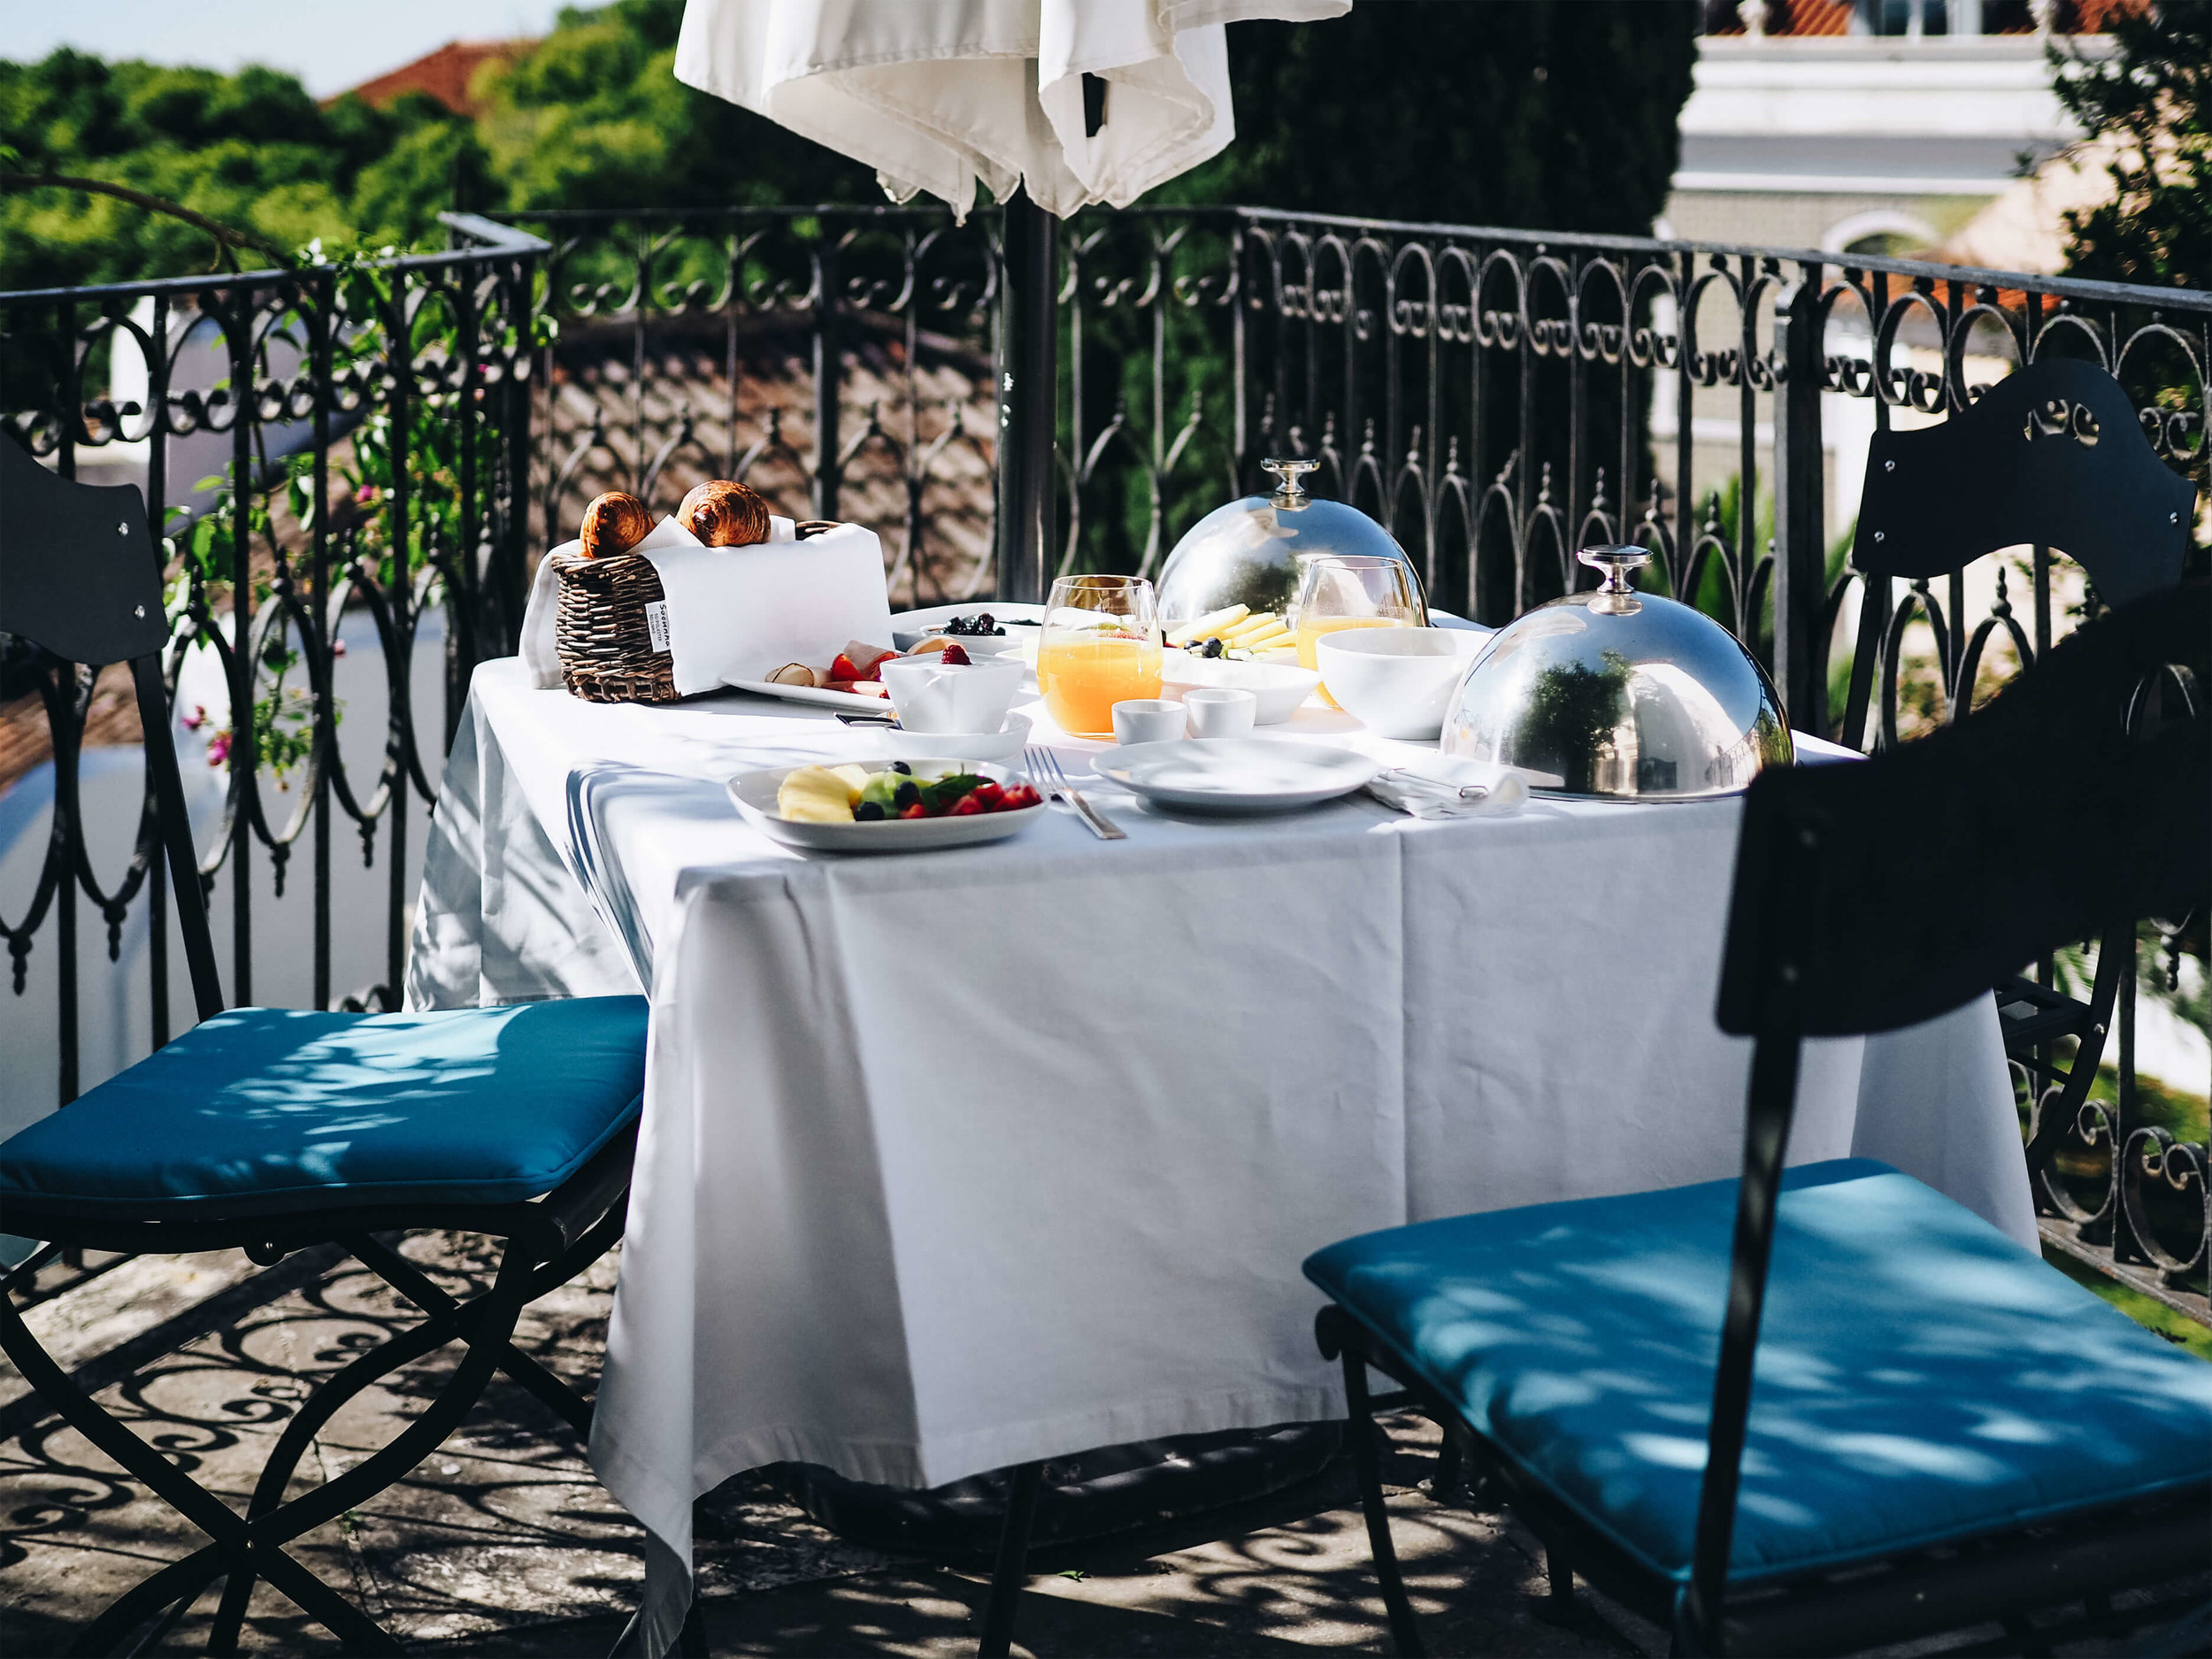 Breakfast in Amadeo de Souza Cardoso suite ┬® Yianis Zahos 4.jpg